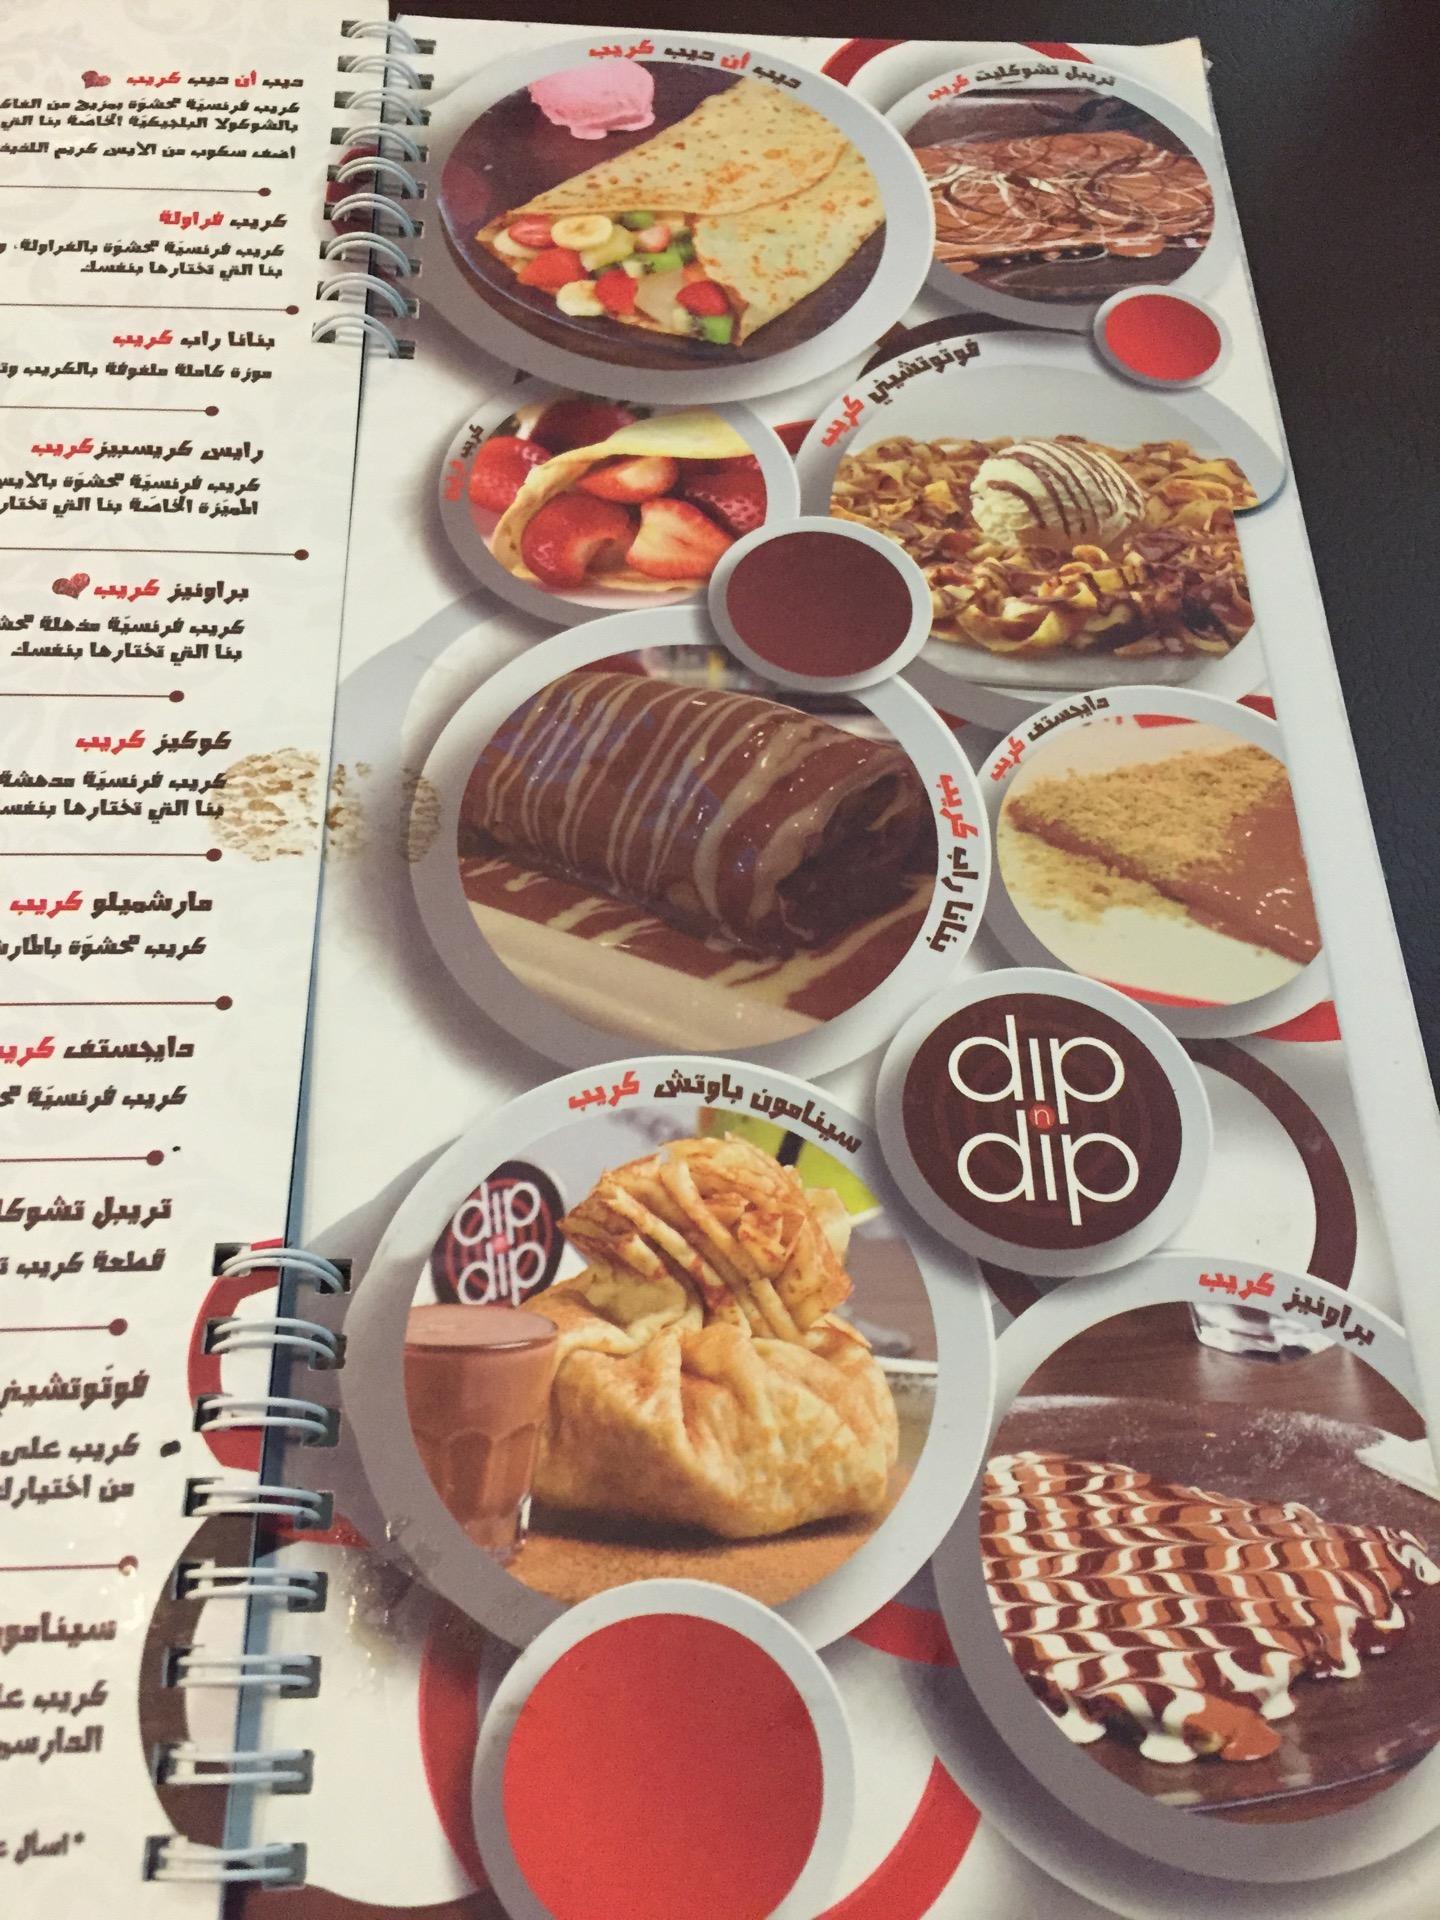 Italian Restaurants Delivery Near Me: Dhahran Mall Restaurant In Khobar